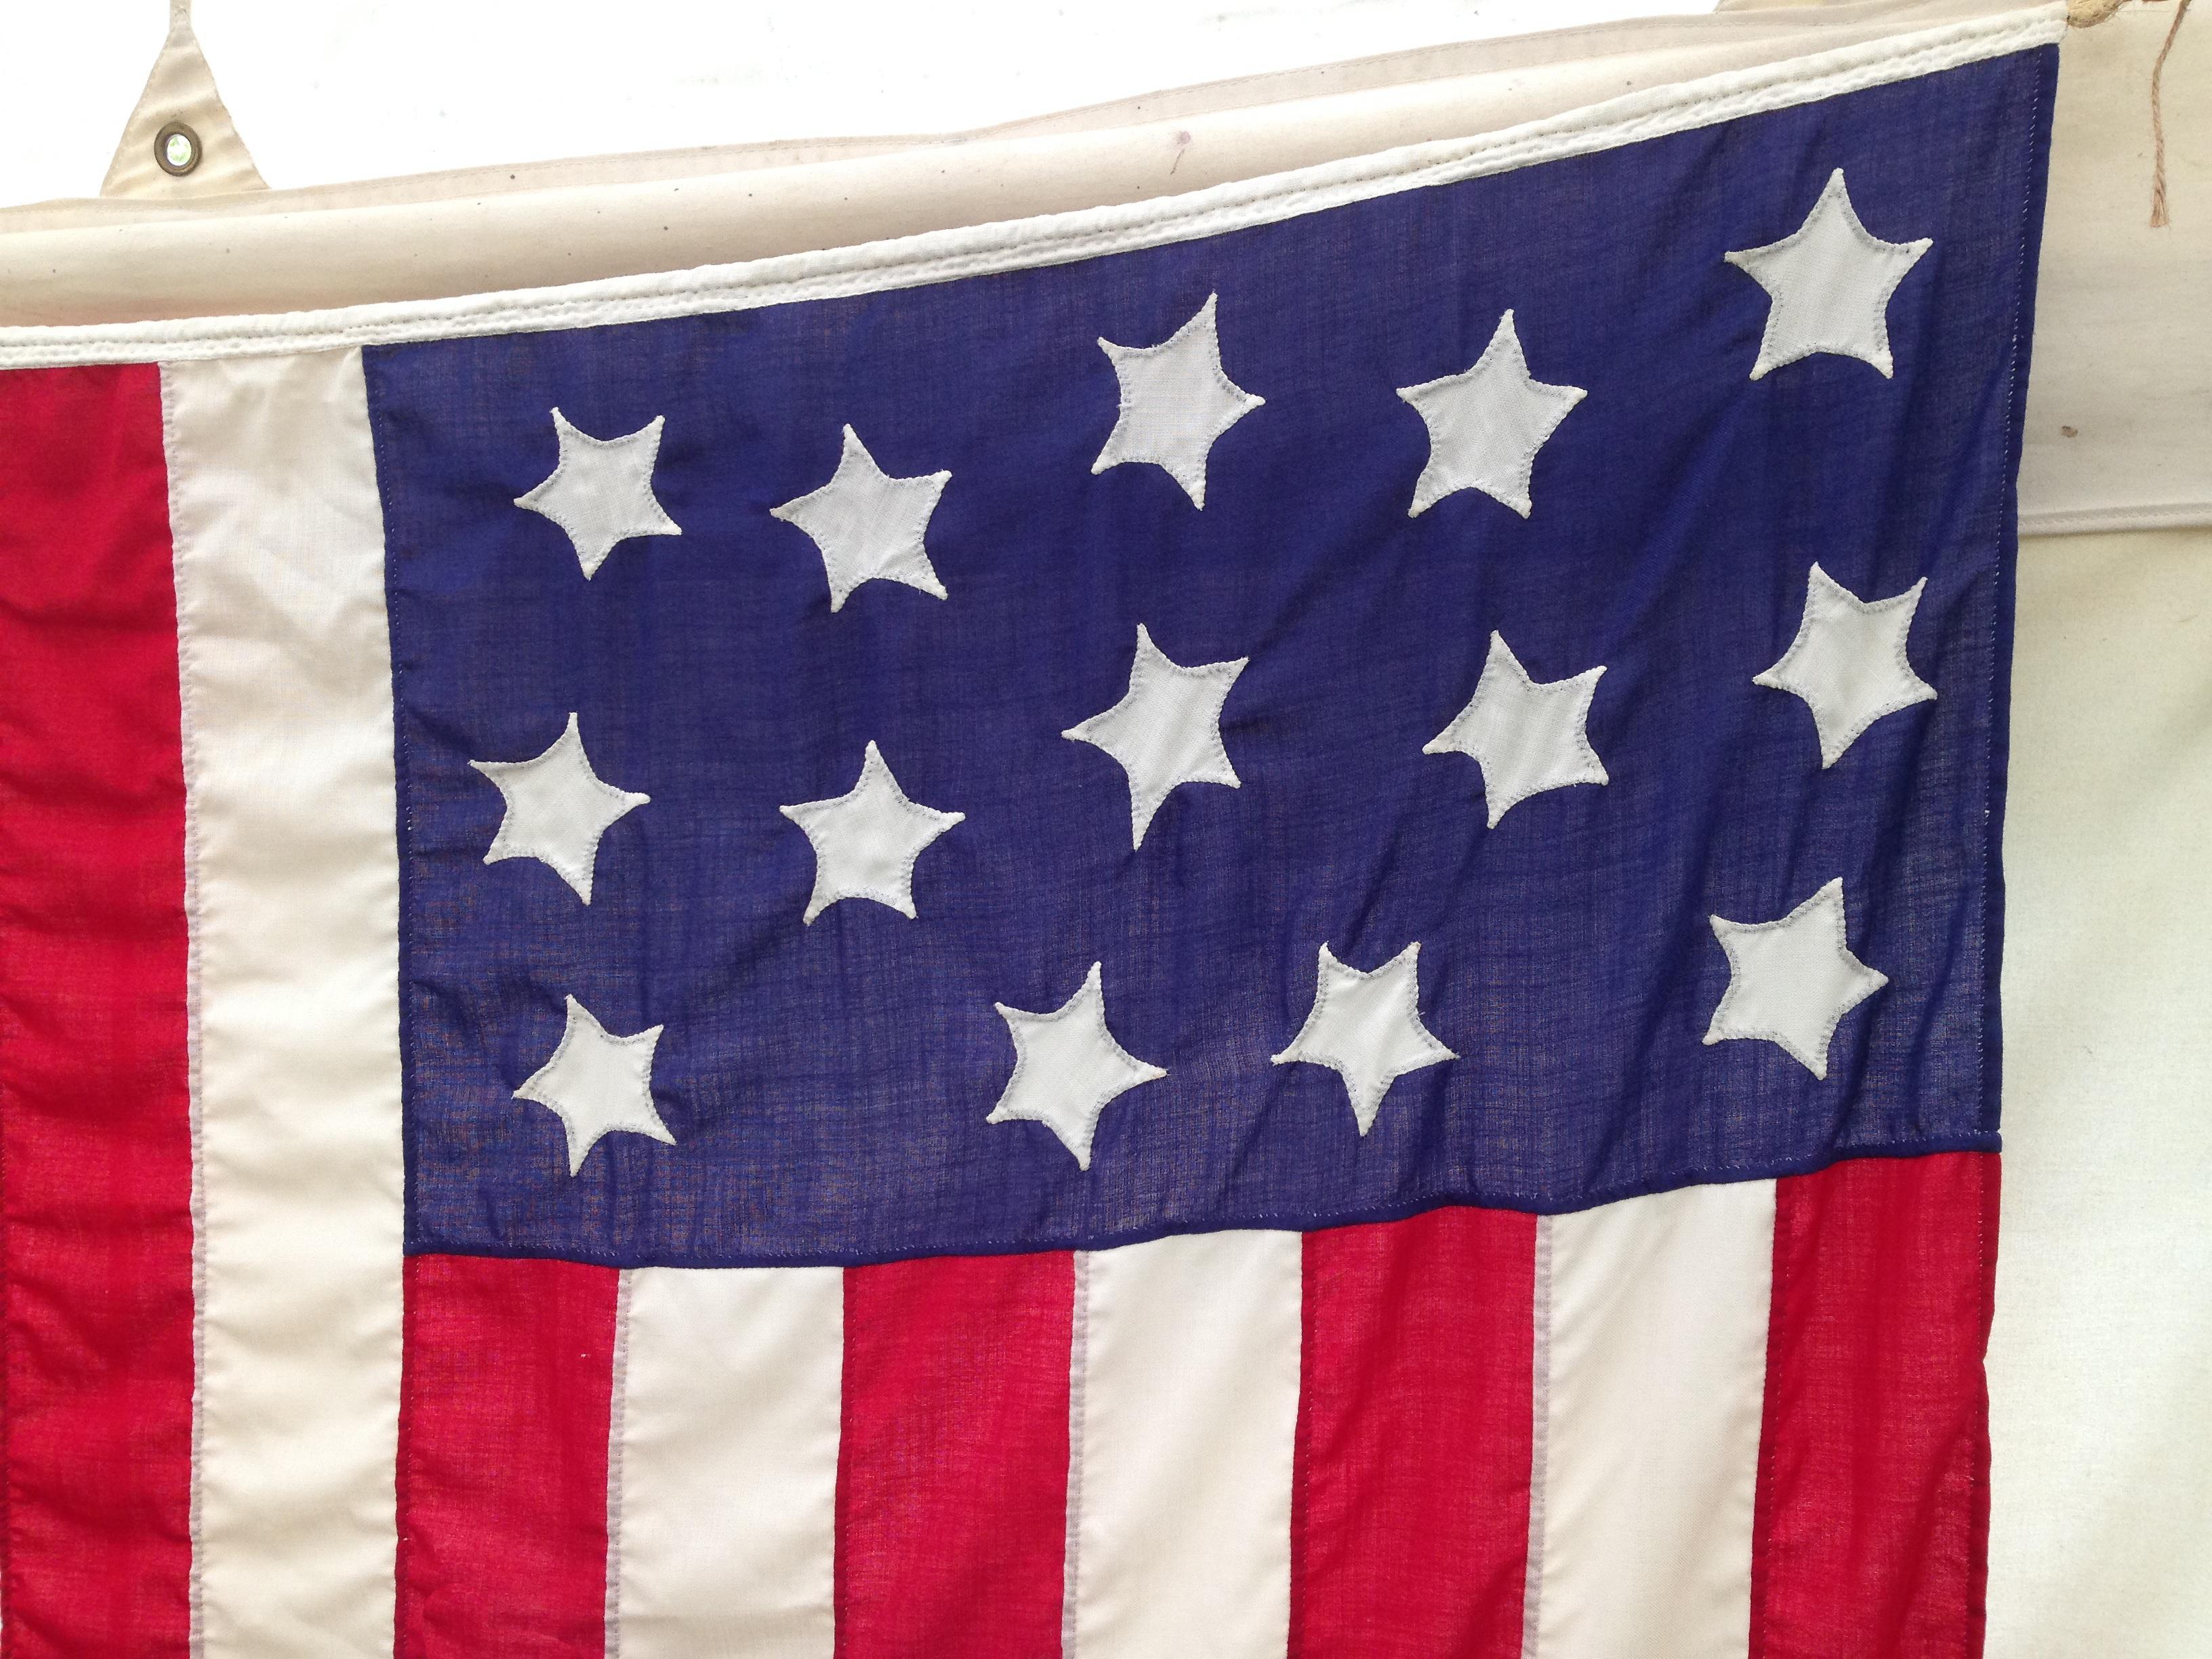 Kostenlose foto : Muster, amerikanische Flagge, Möbel, Material ...